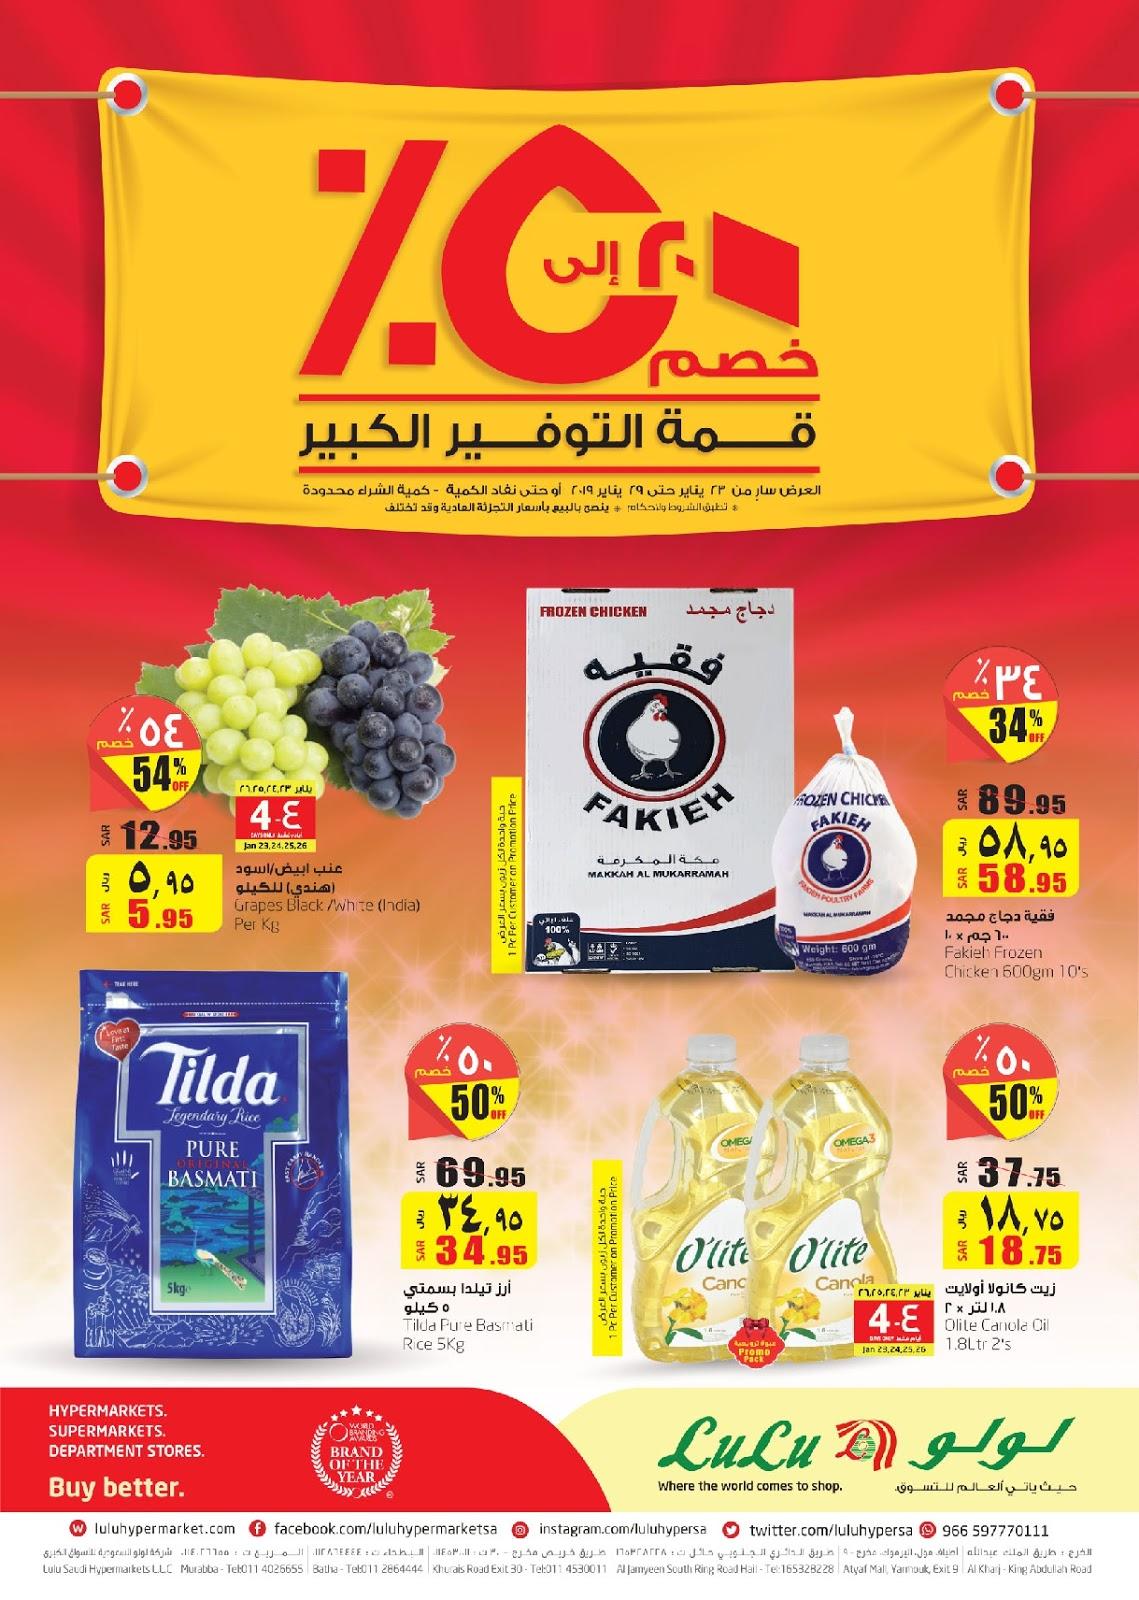 60bfc2987 عروض لولو الرياض الاسبوعية من 23 يناير حتى 29 يناير 2019 قمة التوفير الكبير